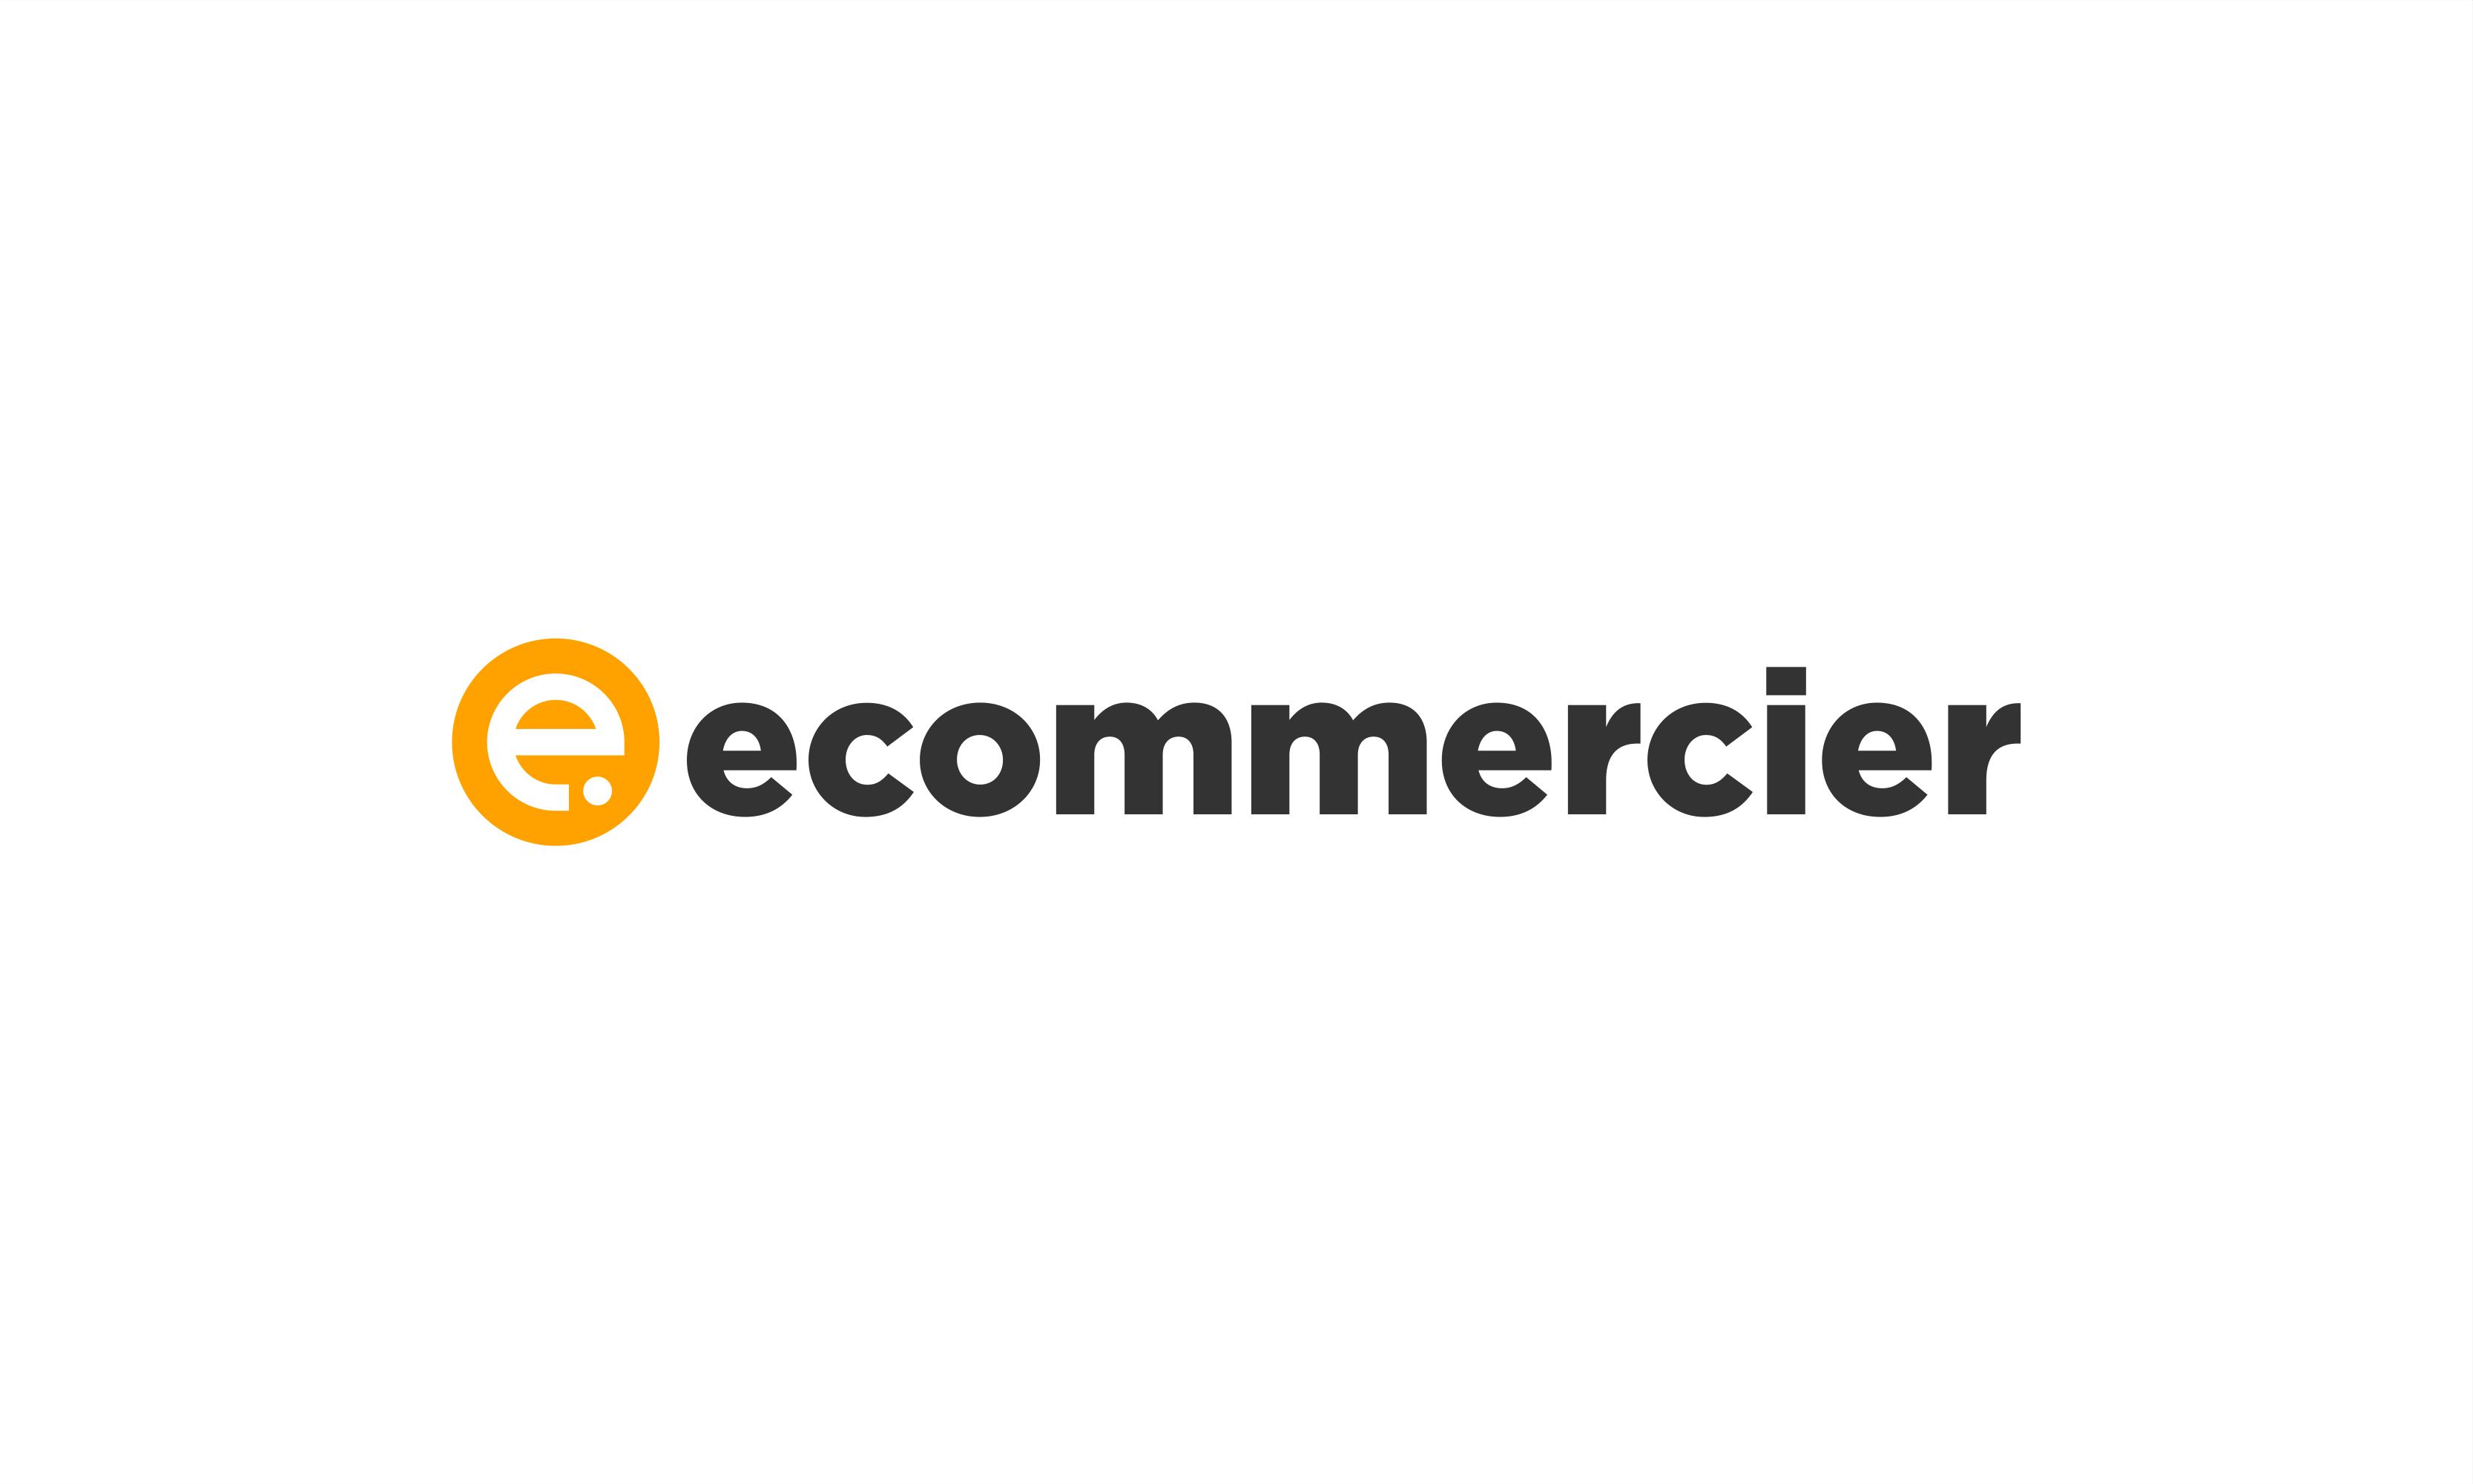 Ecommercier